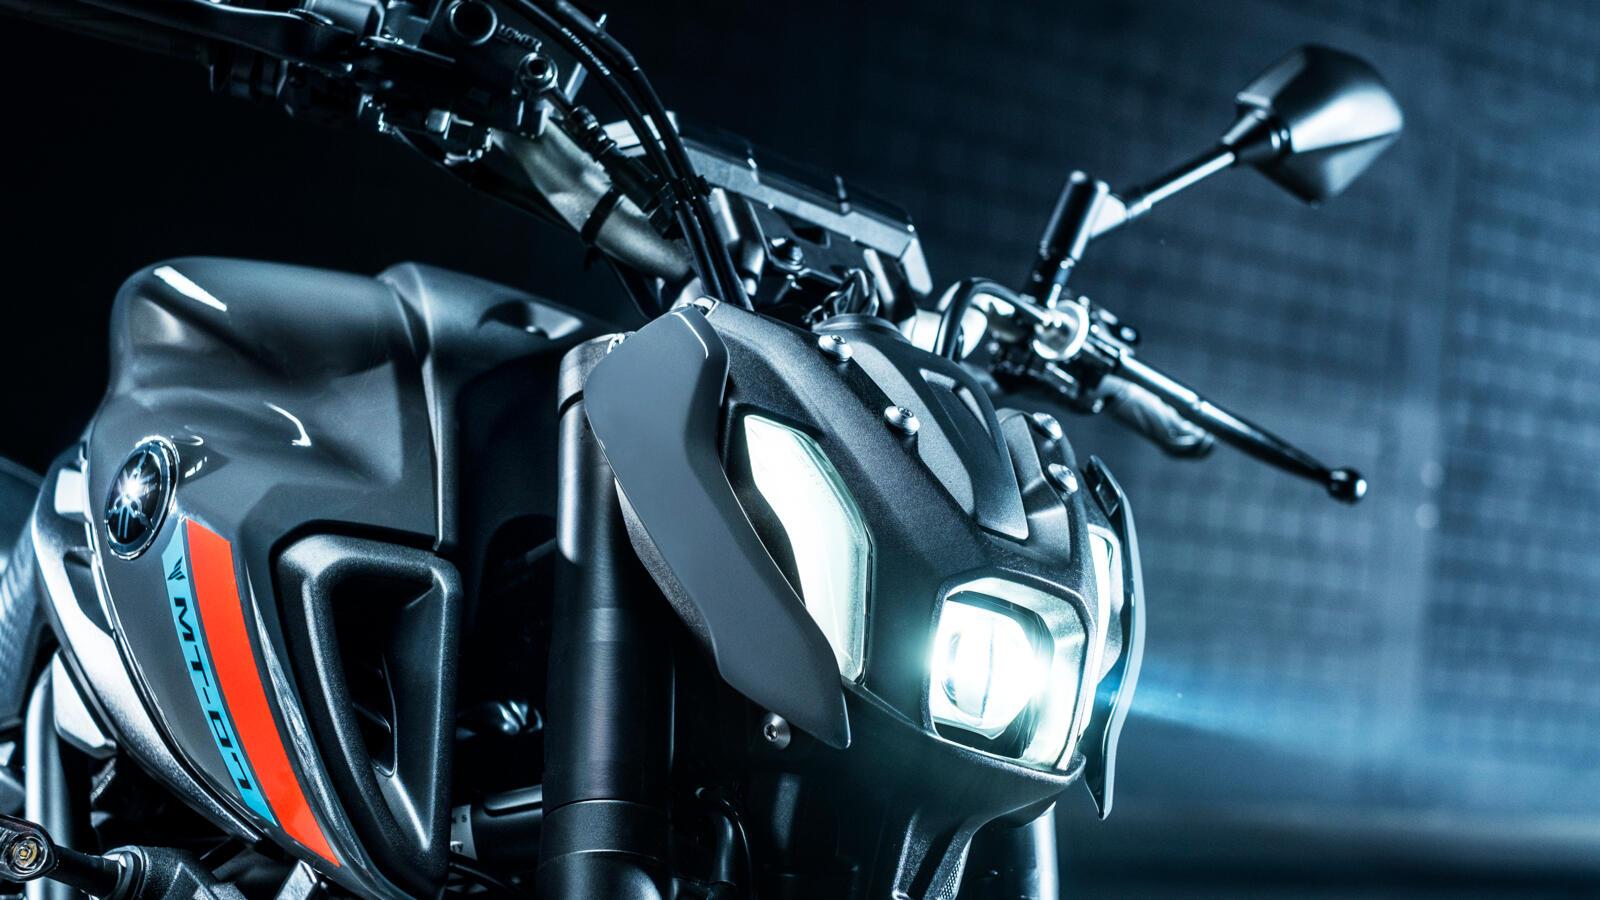 Yamaha-MT-07-my2021-13